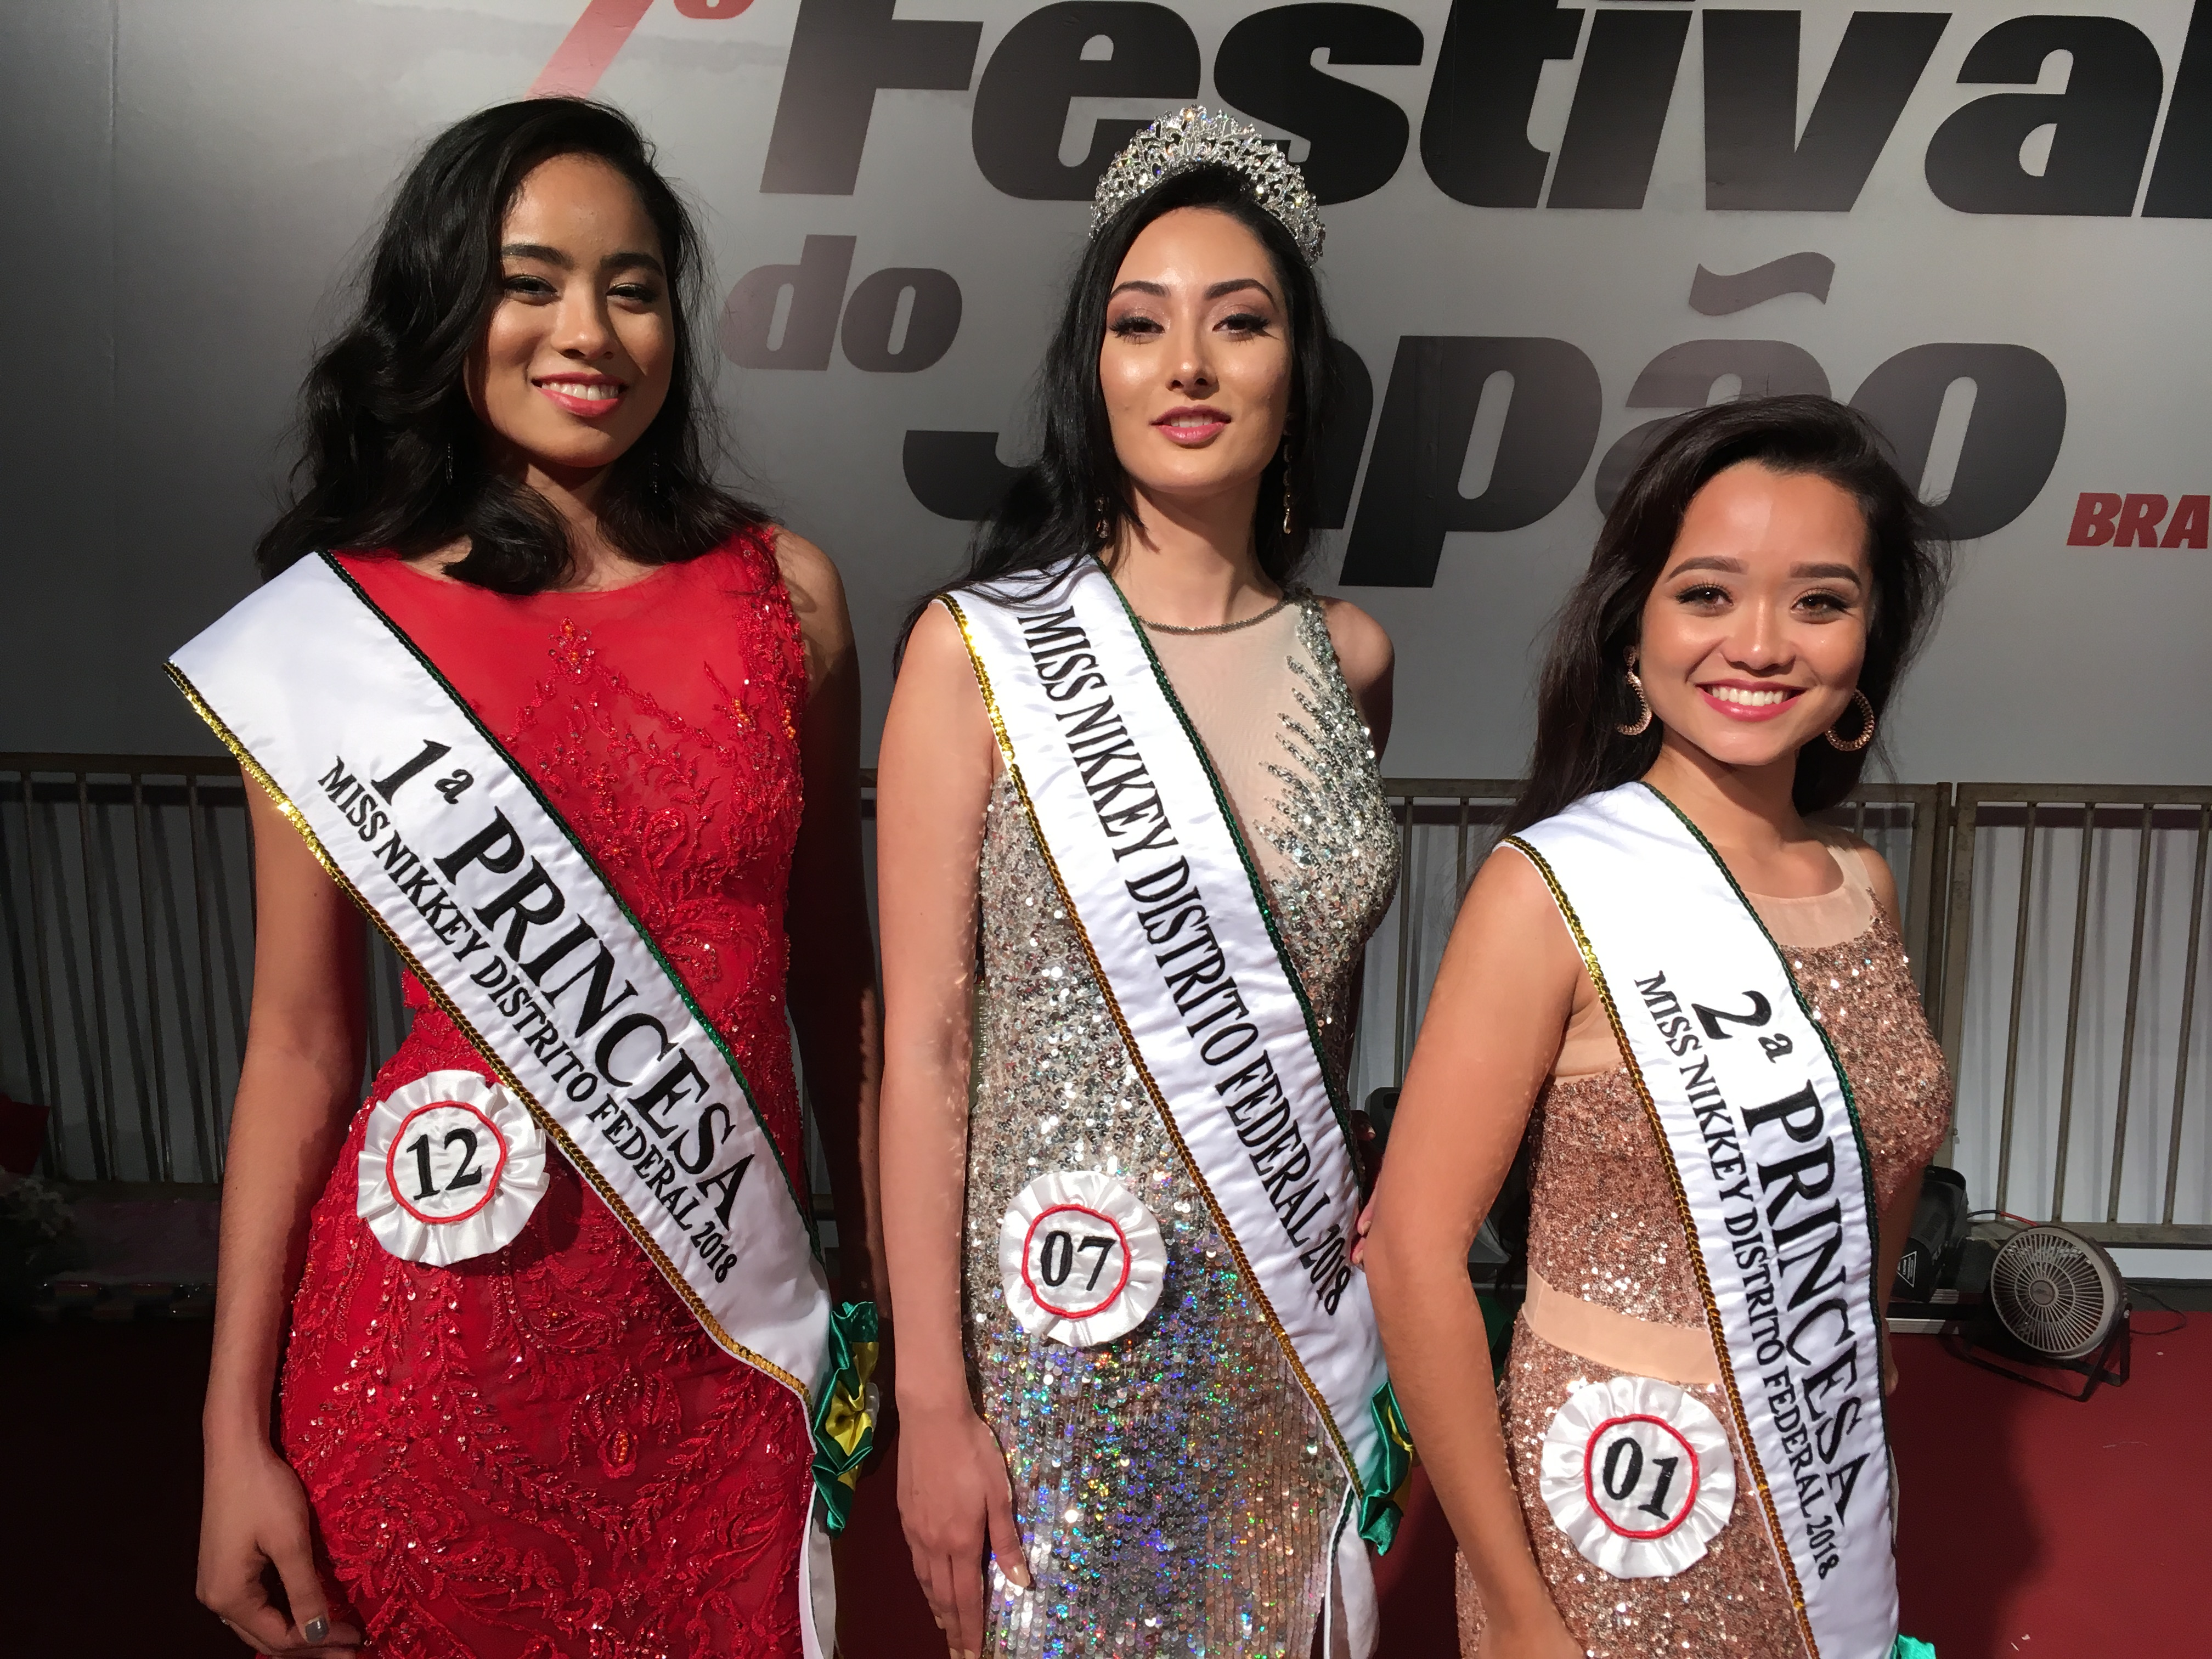 Miss Nikkey Distrito Federal 2018